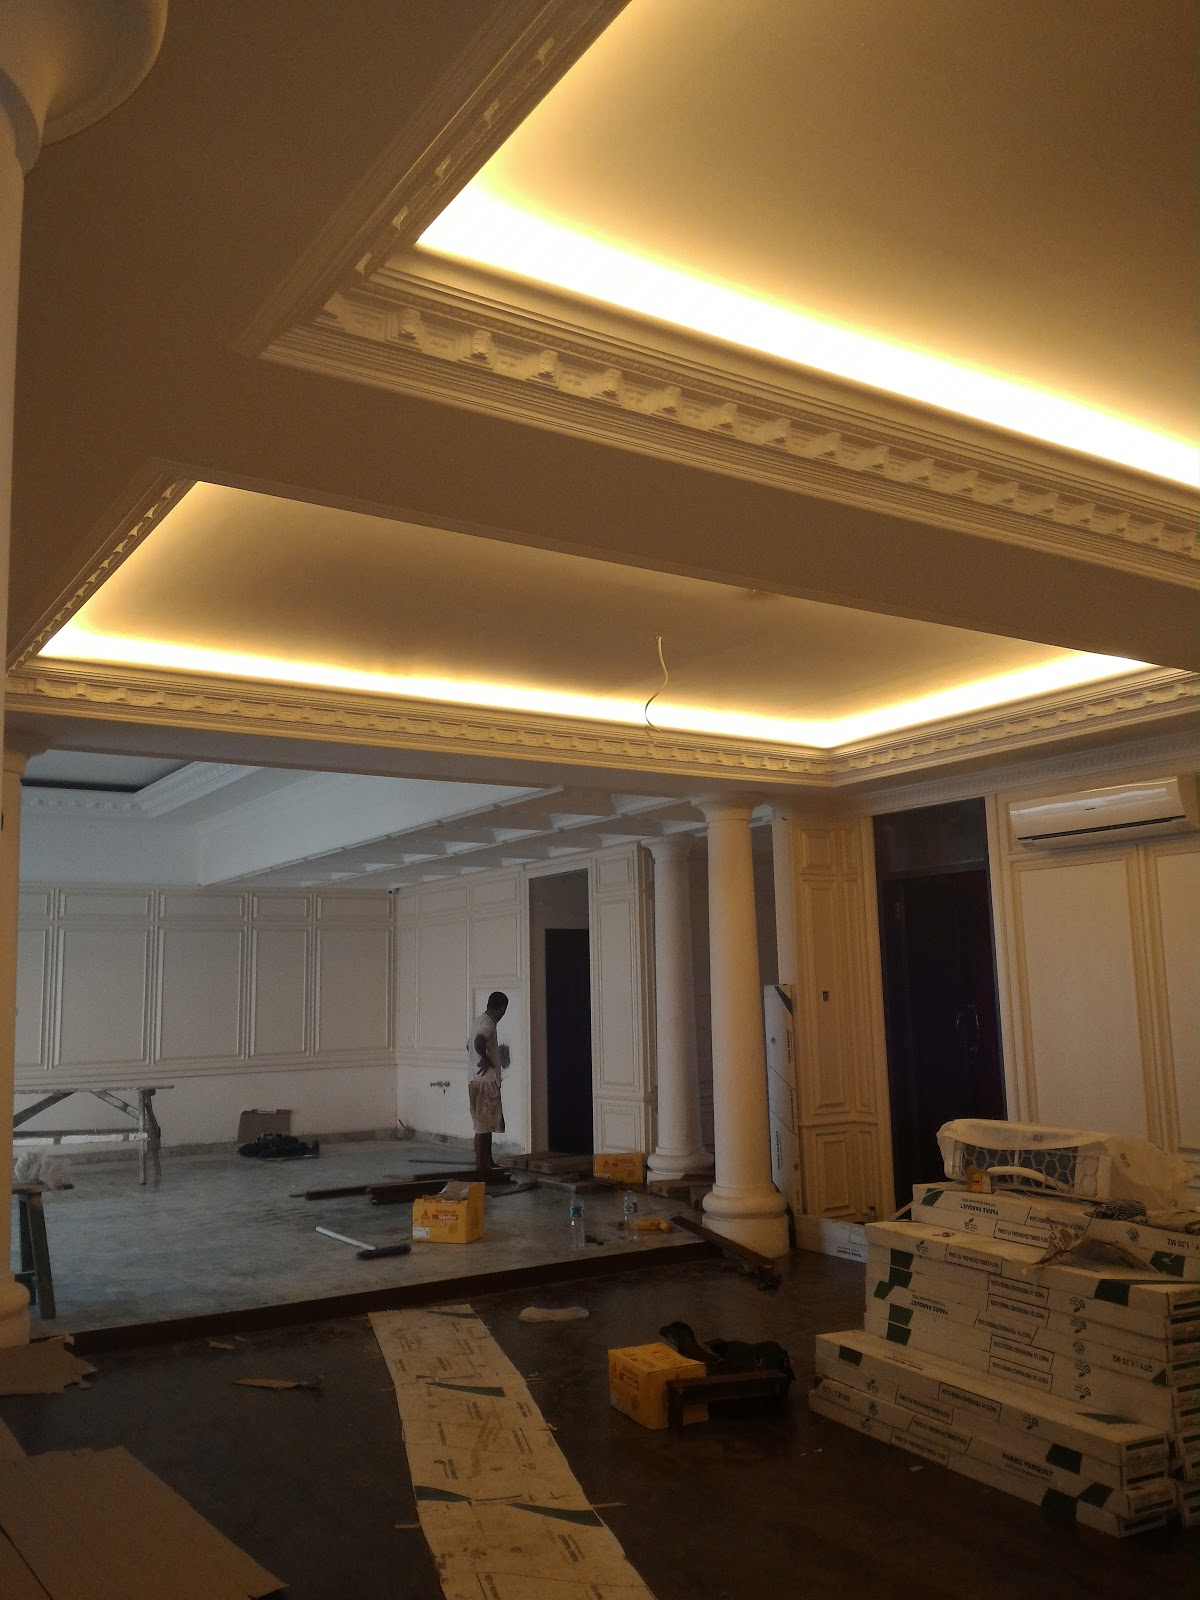 Harga Pasang Plafond Gypsum Terpasang Permeter Persegi